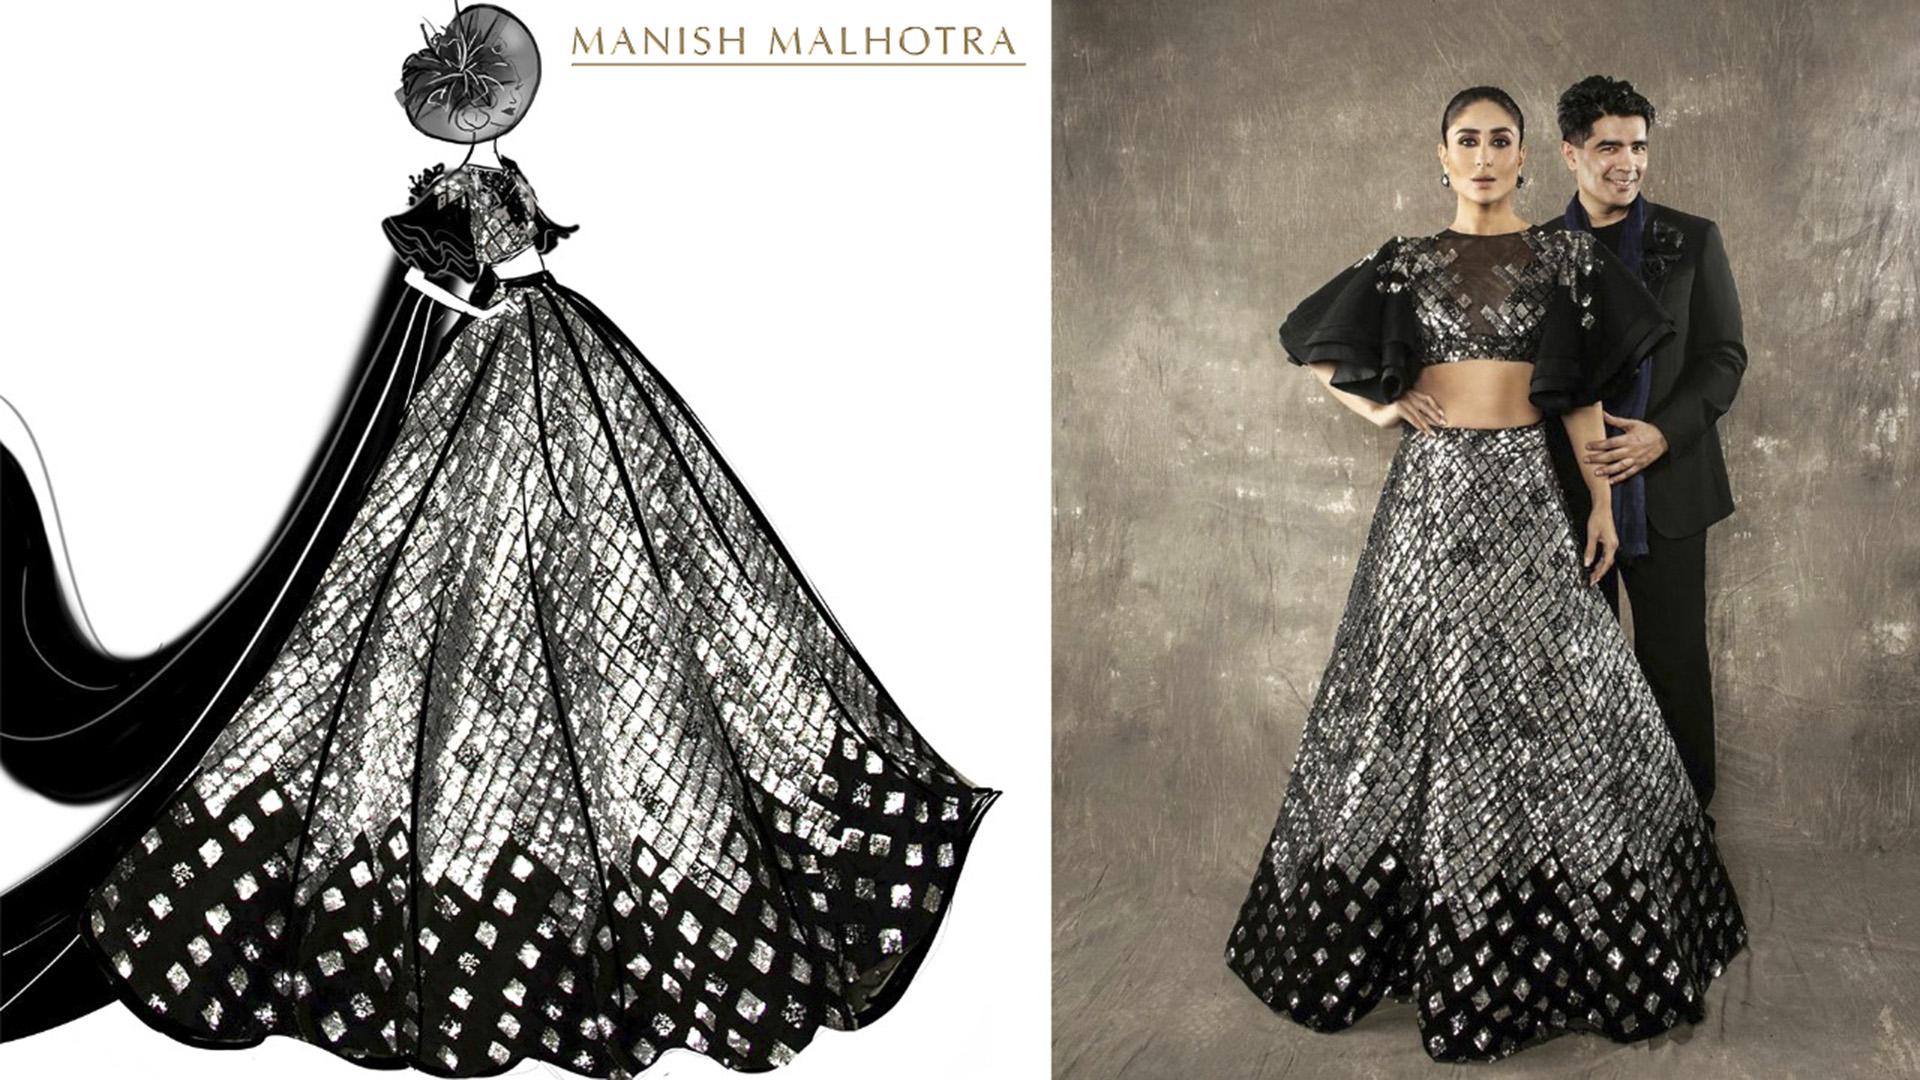 Designer Manish Malhotra Brings NFT To Indian Fashion Industry